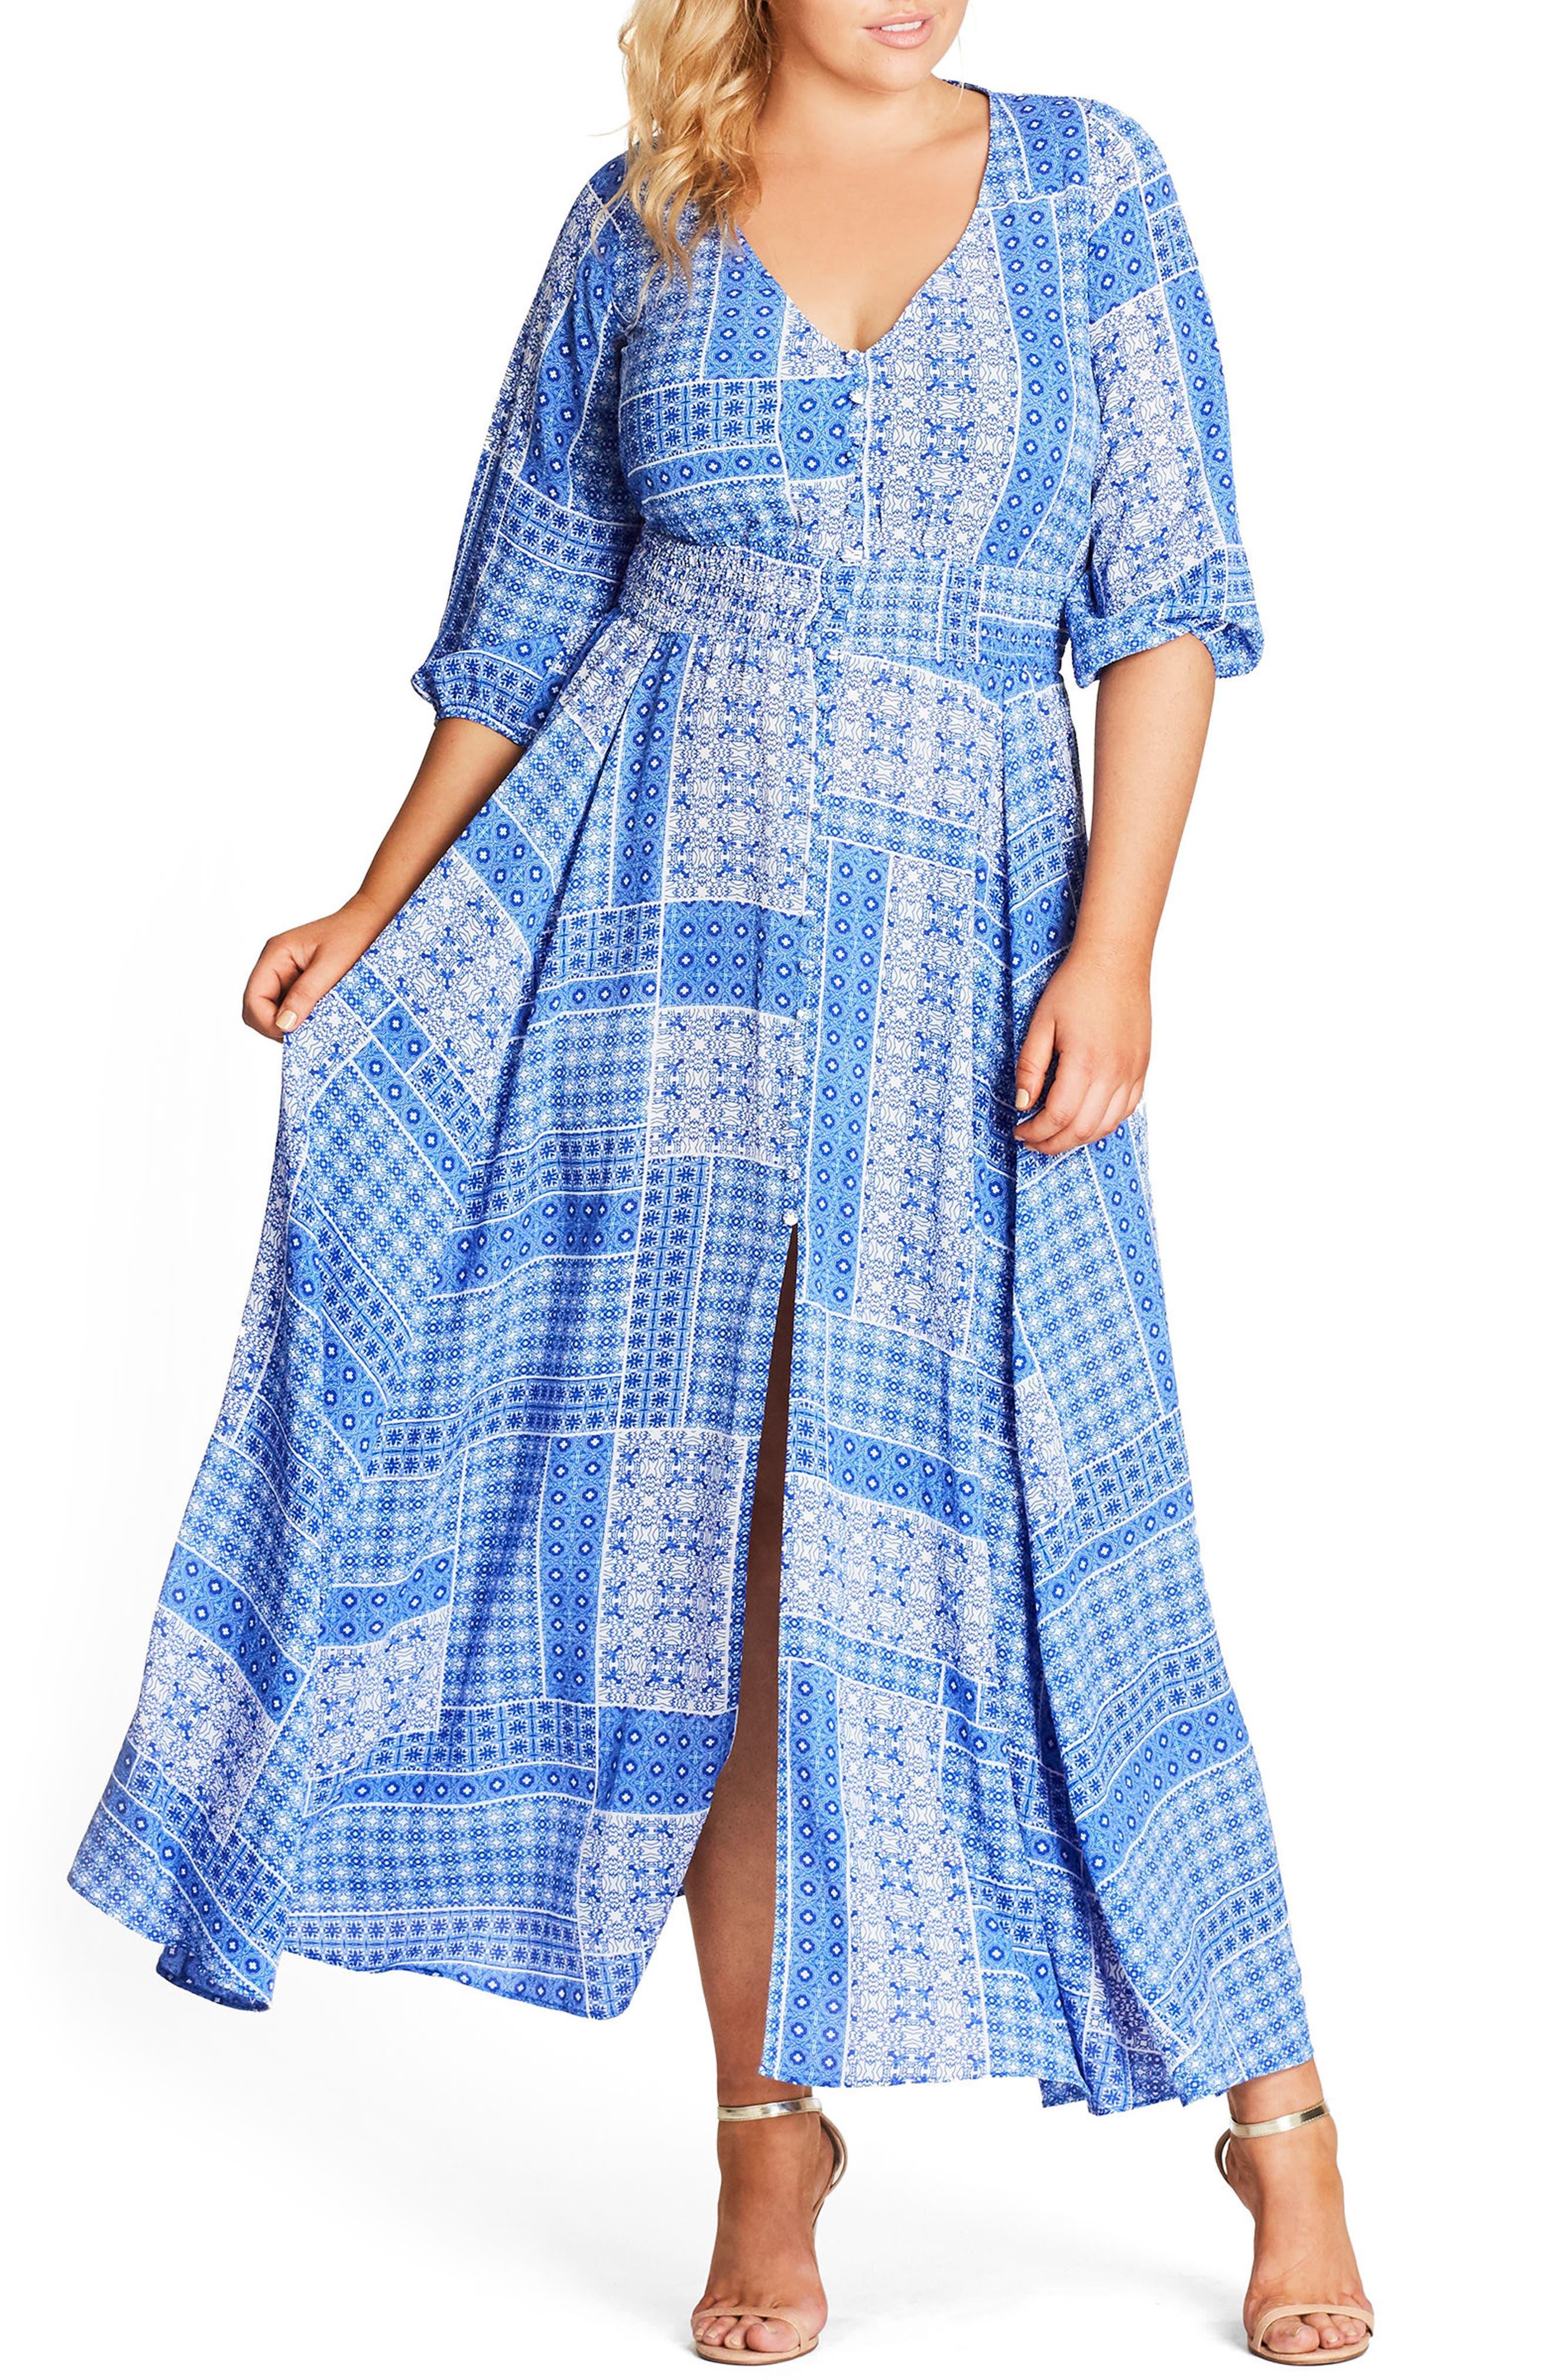 Plus Size City Chic China Plate A-Line Maxi Dress